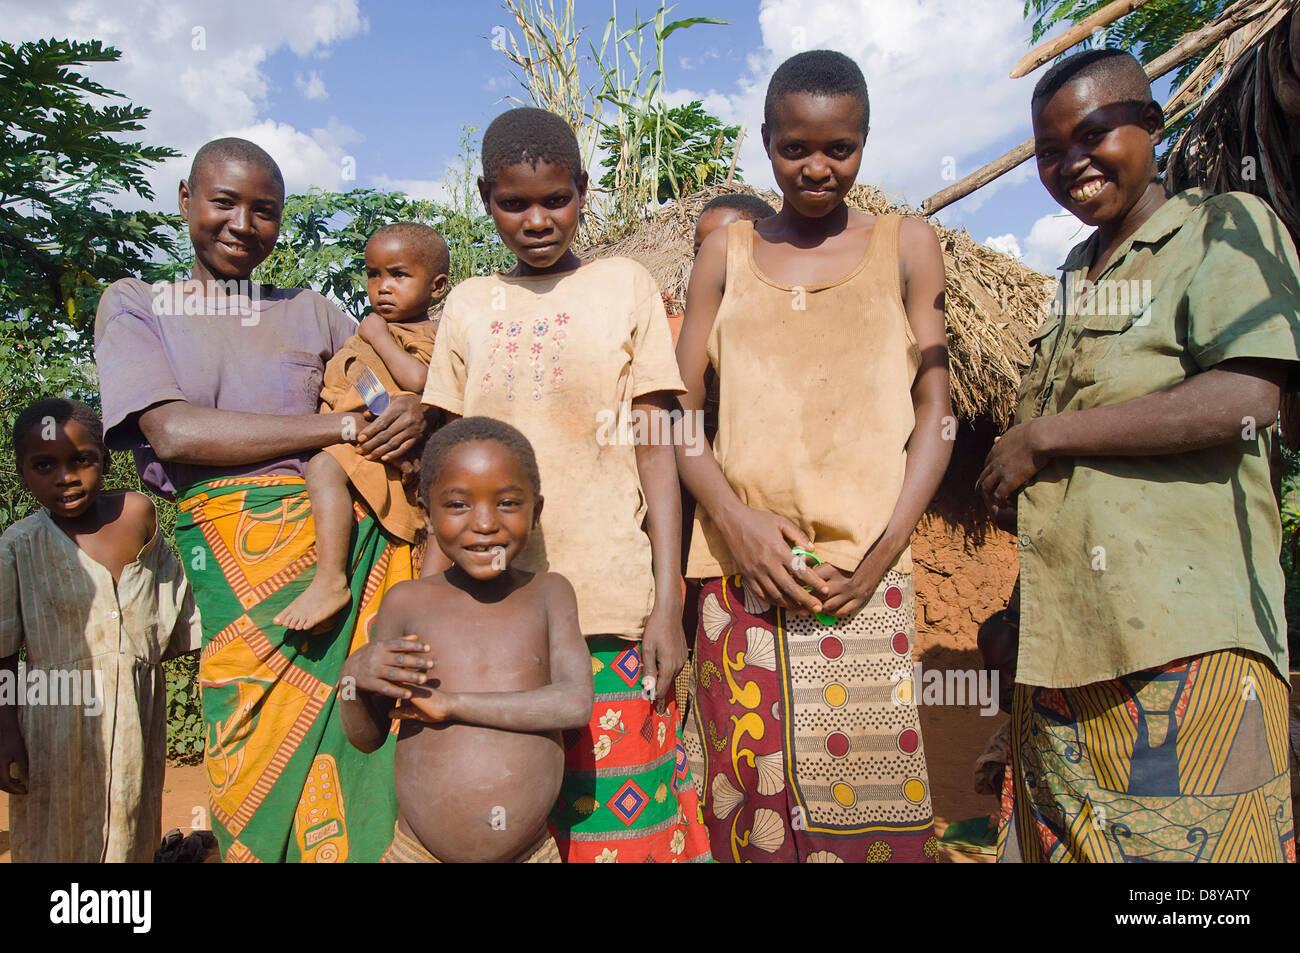 Burundi kirundo a familie neben der stra e leben in armut for Minimalistisch leben mit familie